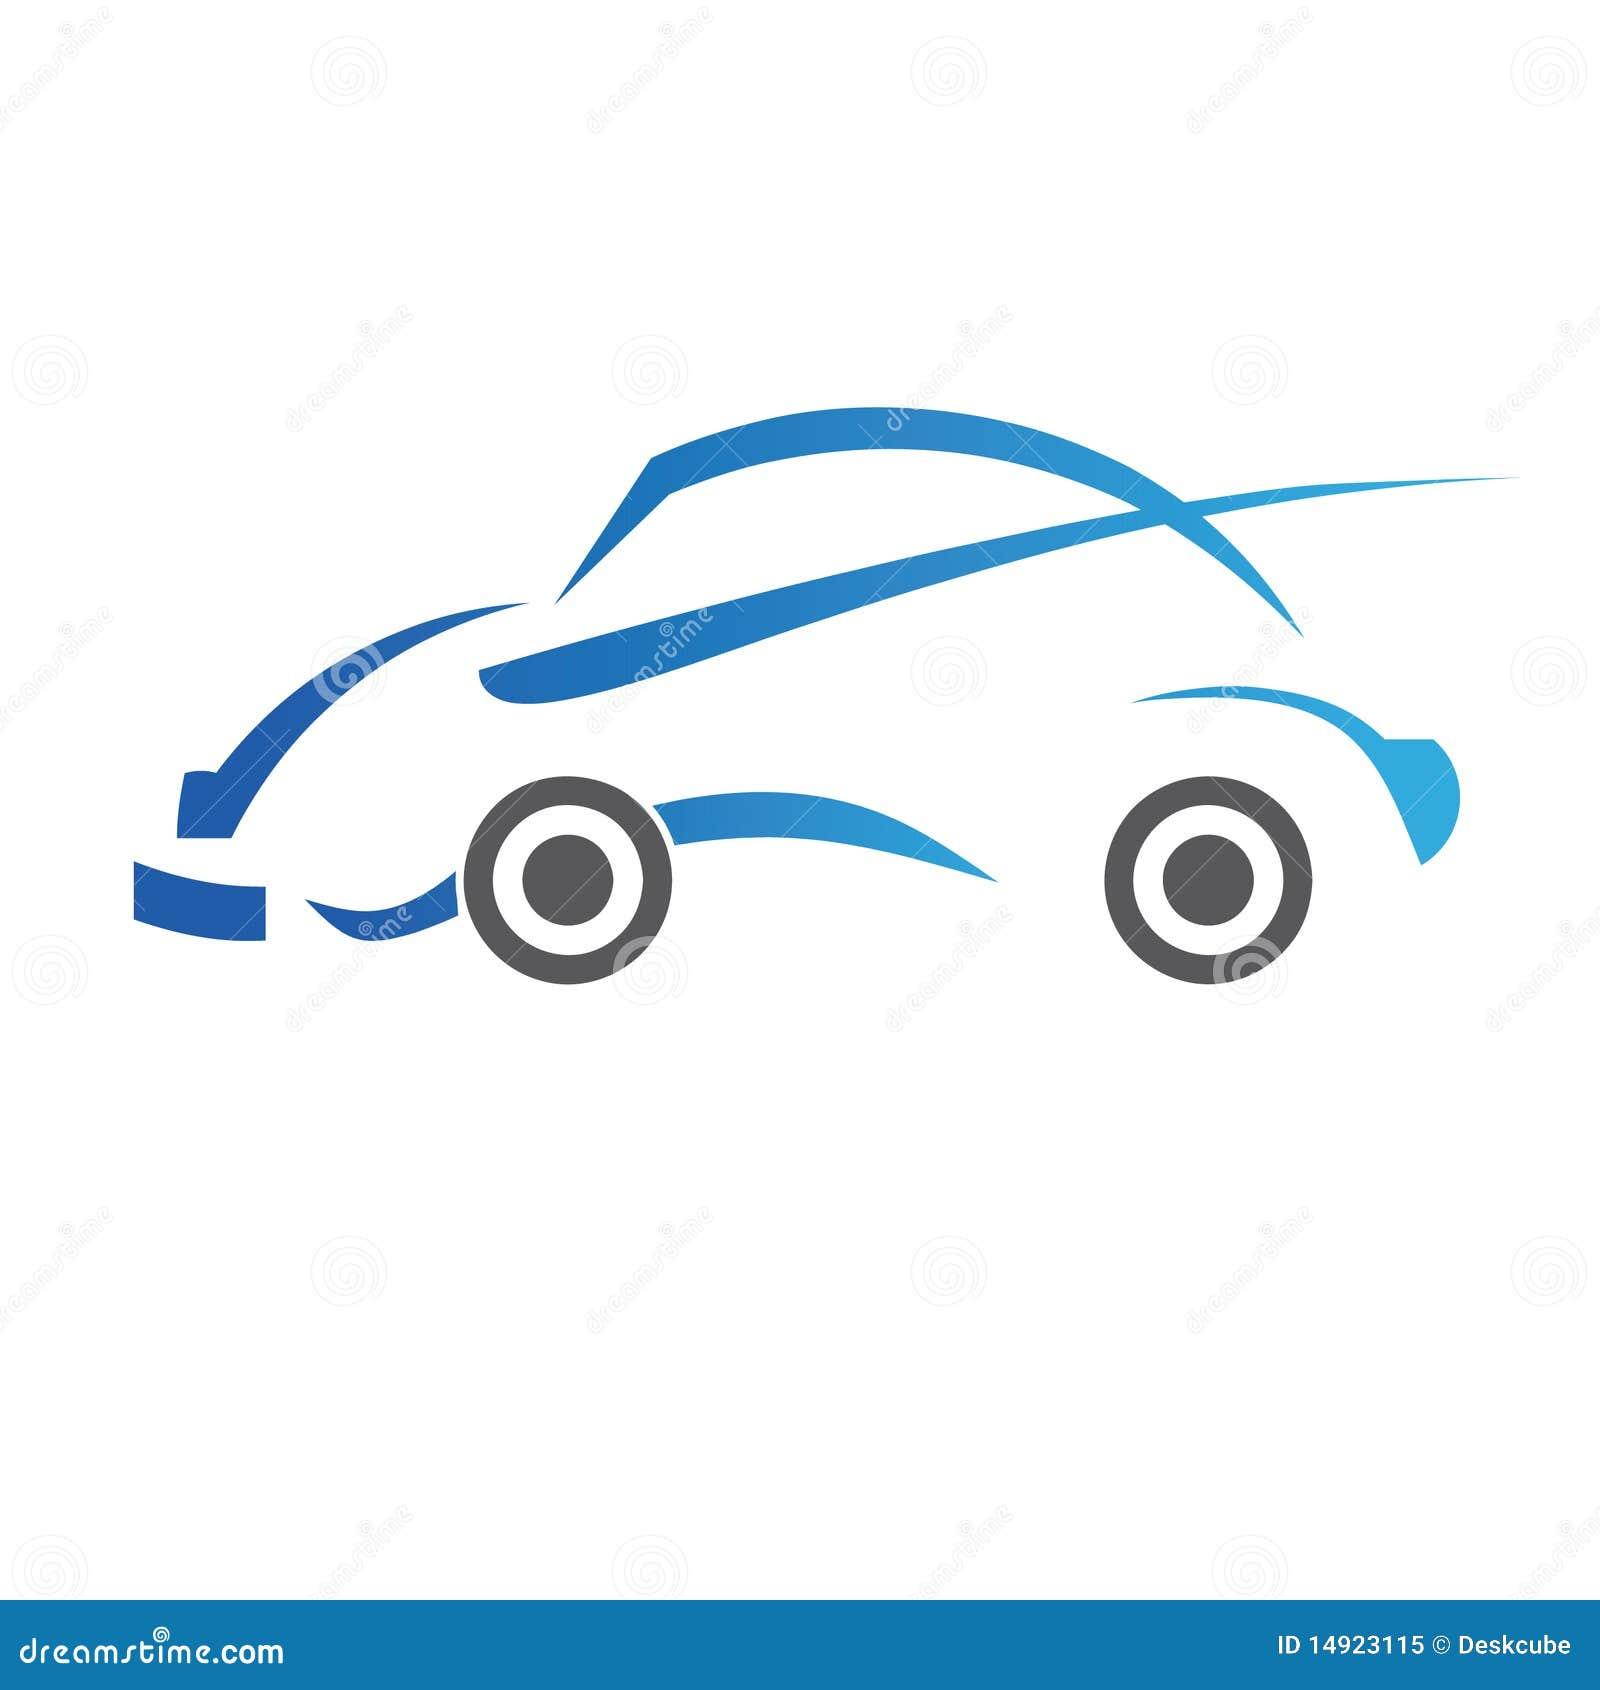 Blue Book Automobile Prices Logo Car Design Royalty Free Stock Photo - Image: 14923115